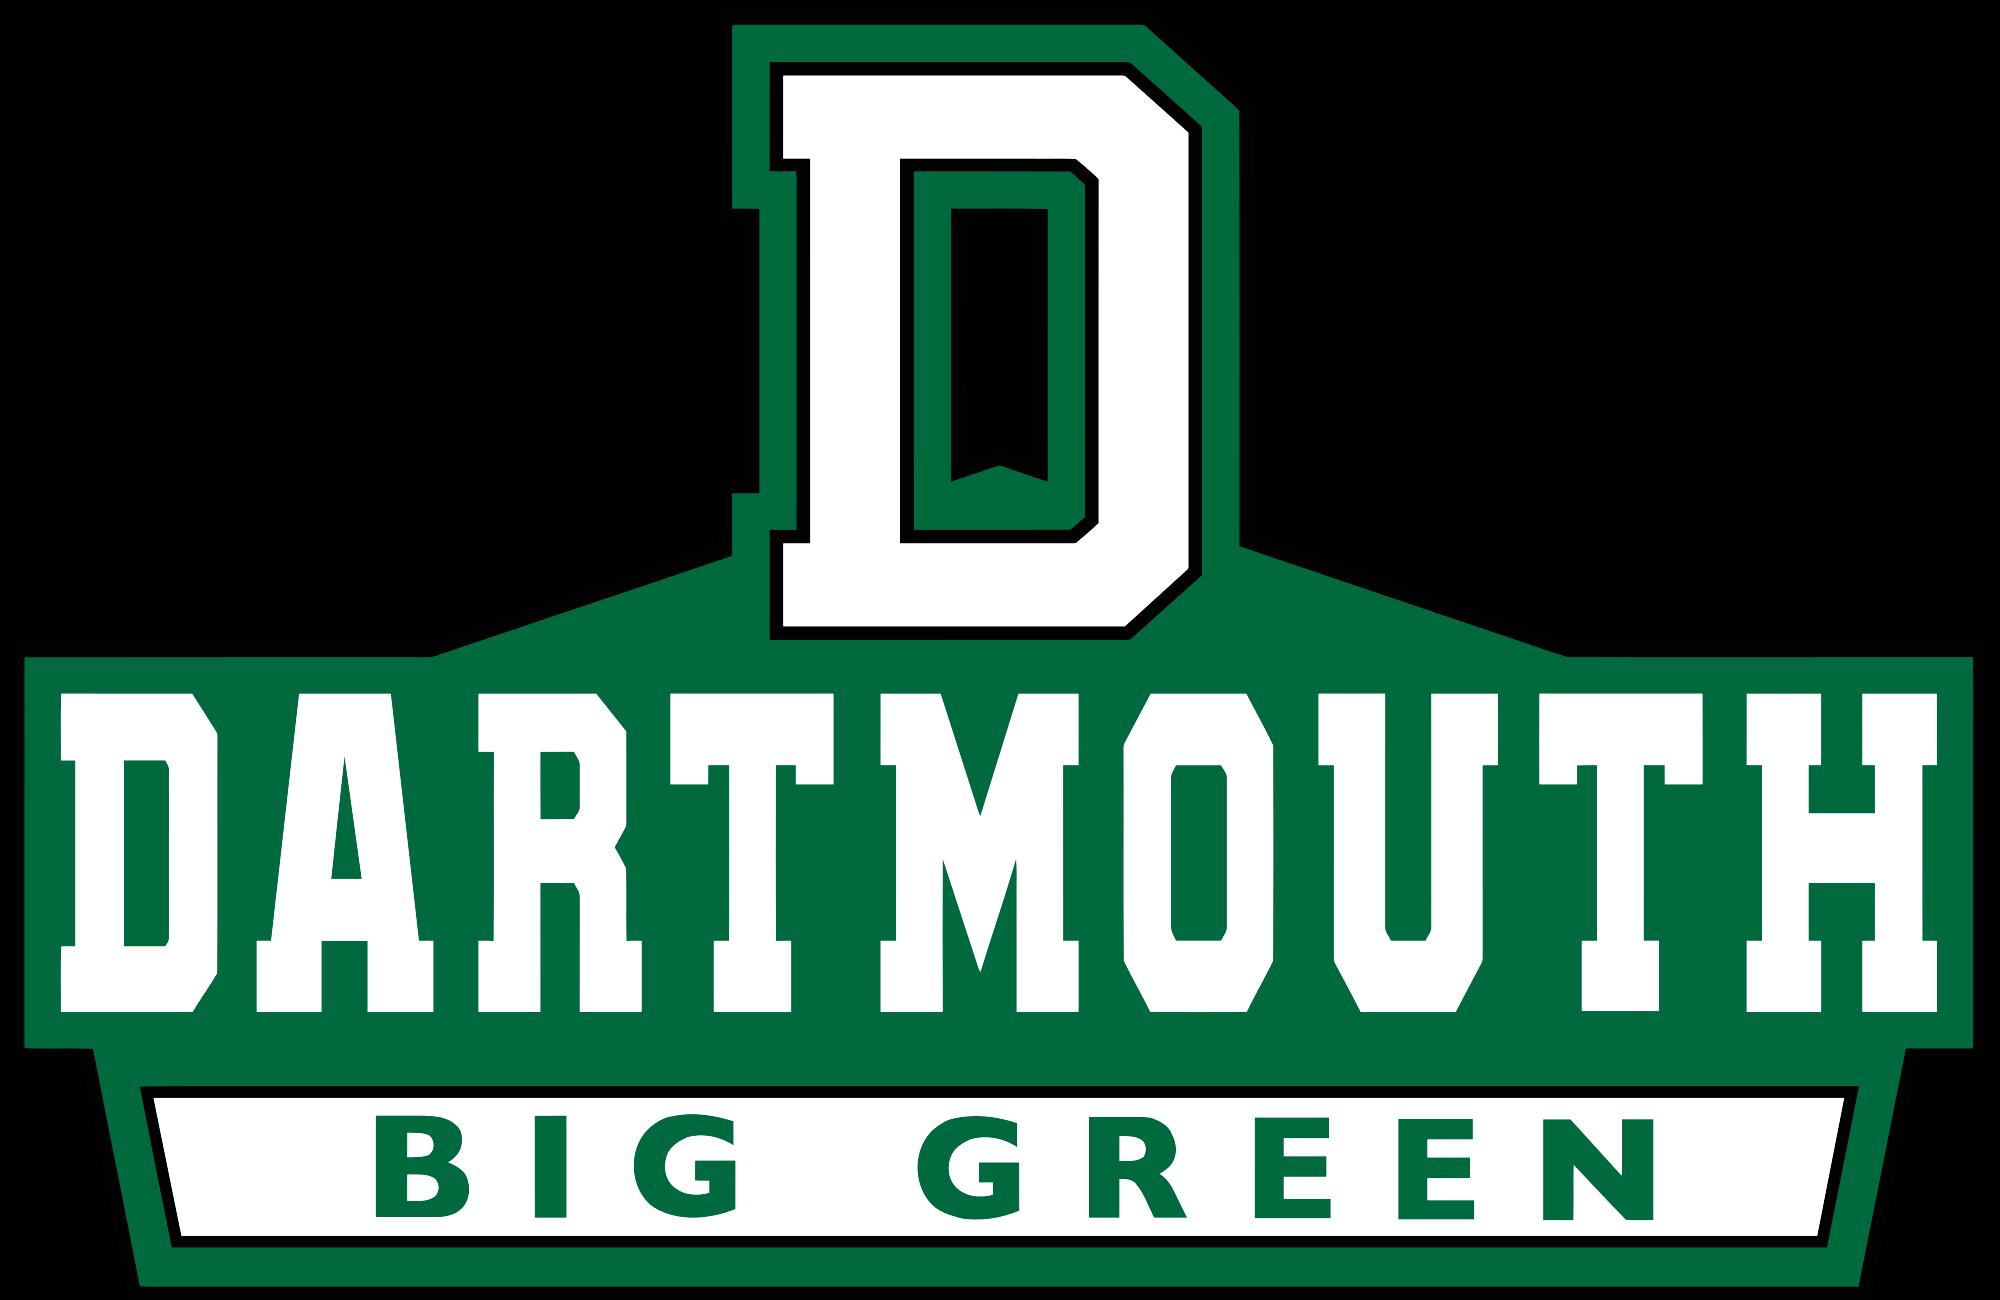 Dartmouth_Big_Green 3.png